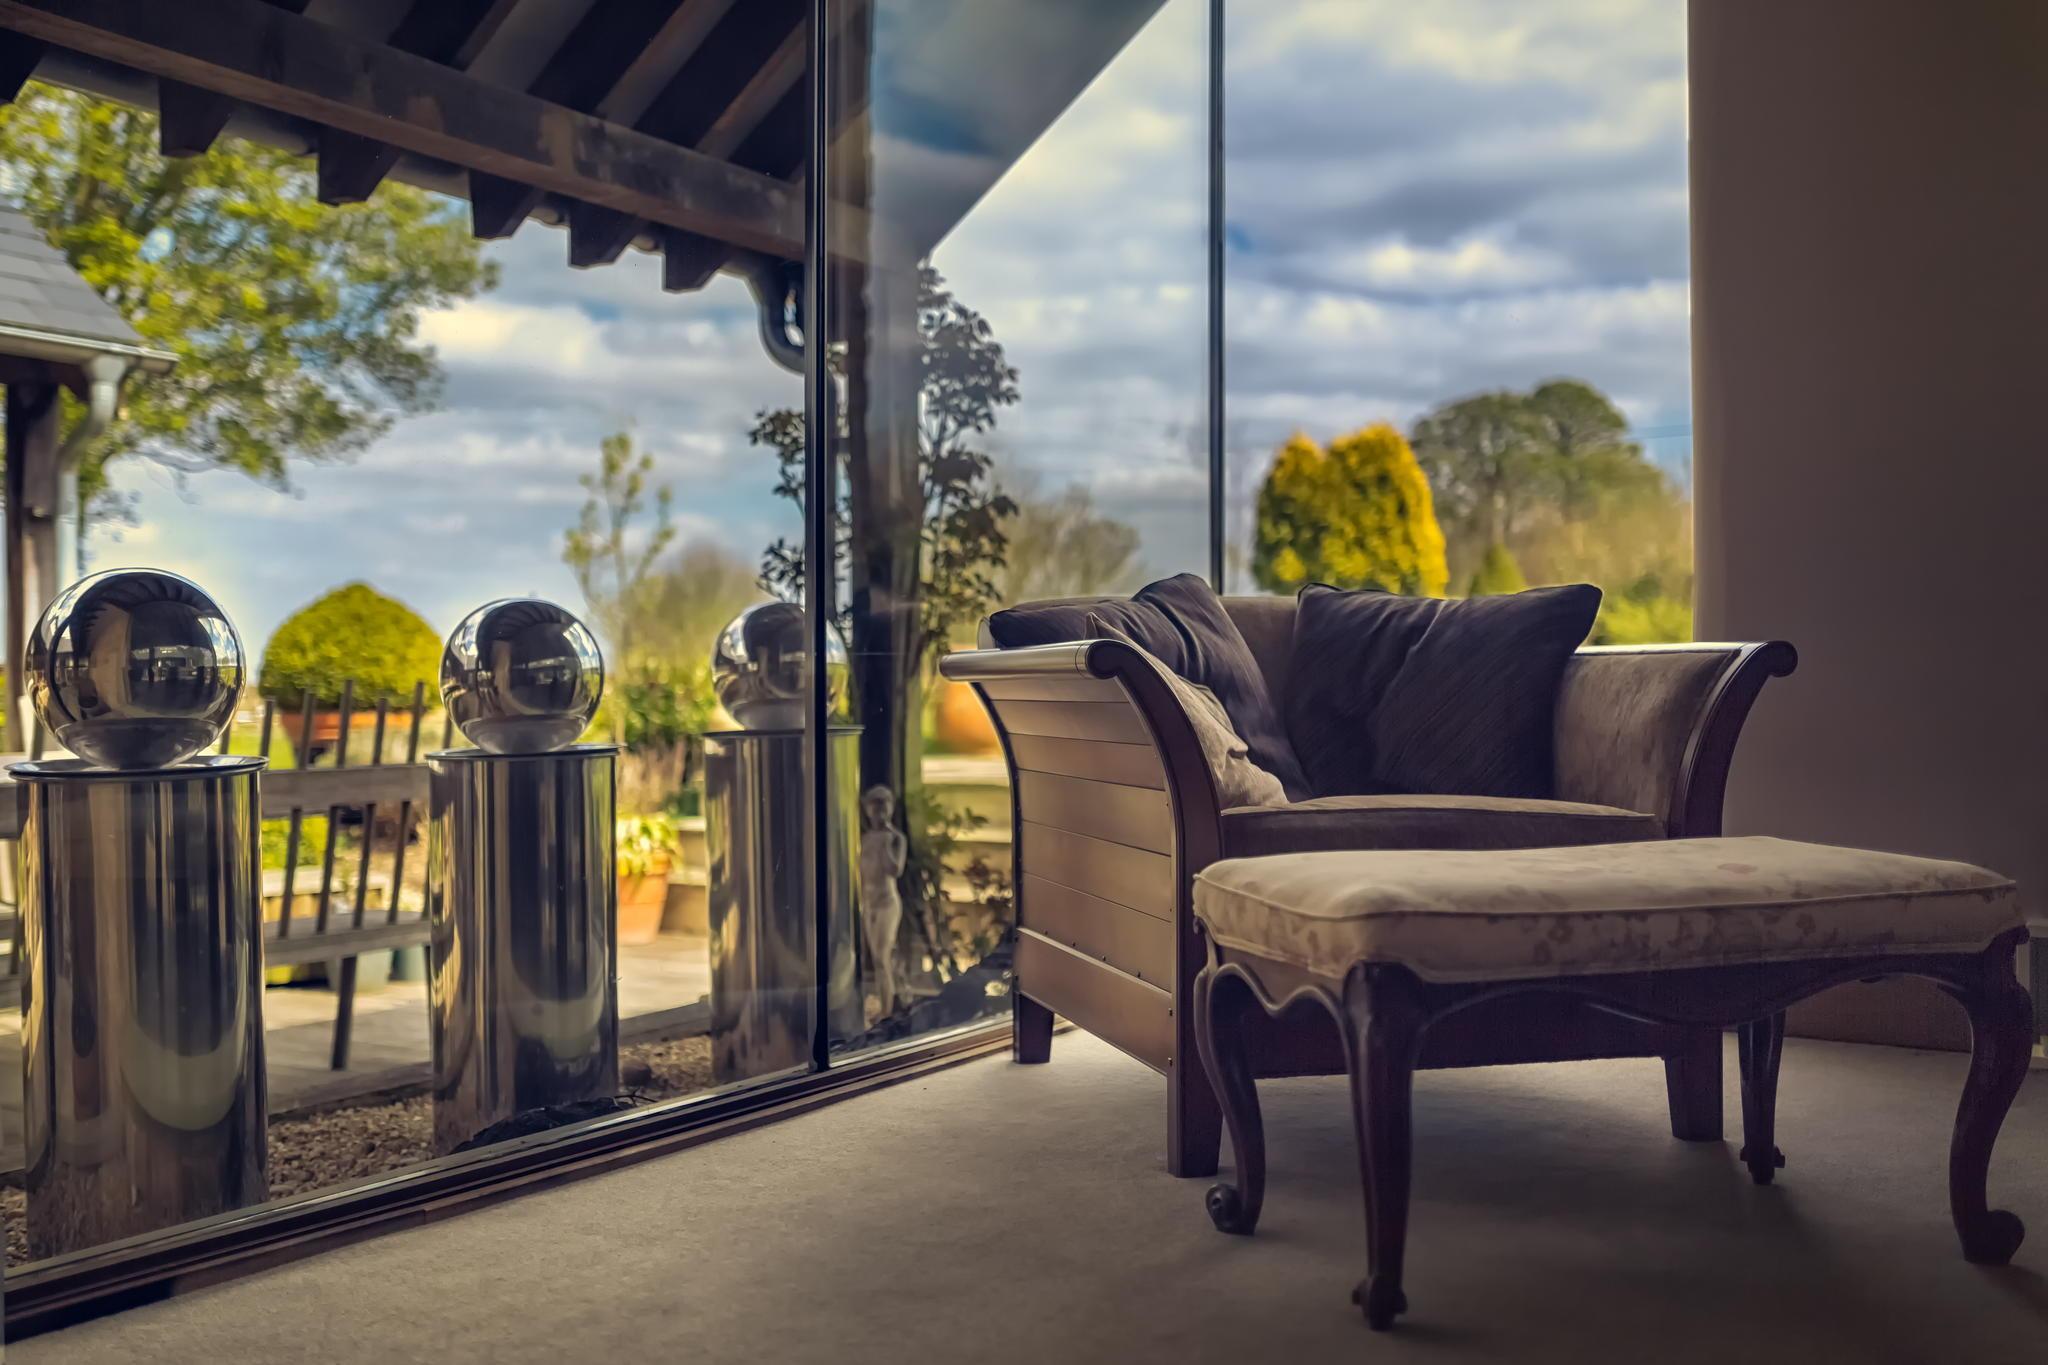 Комната кресло окно балкон терасса мебель интерьер hd обои д.